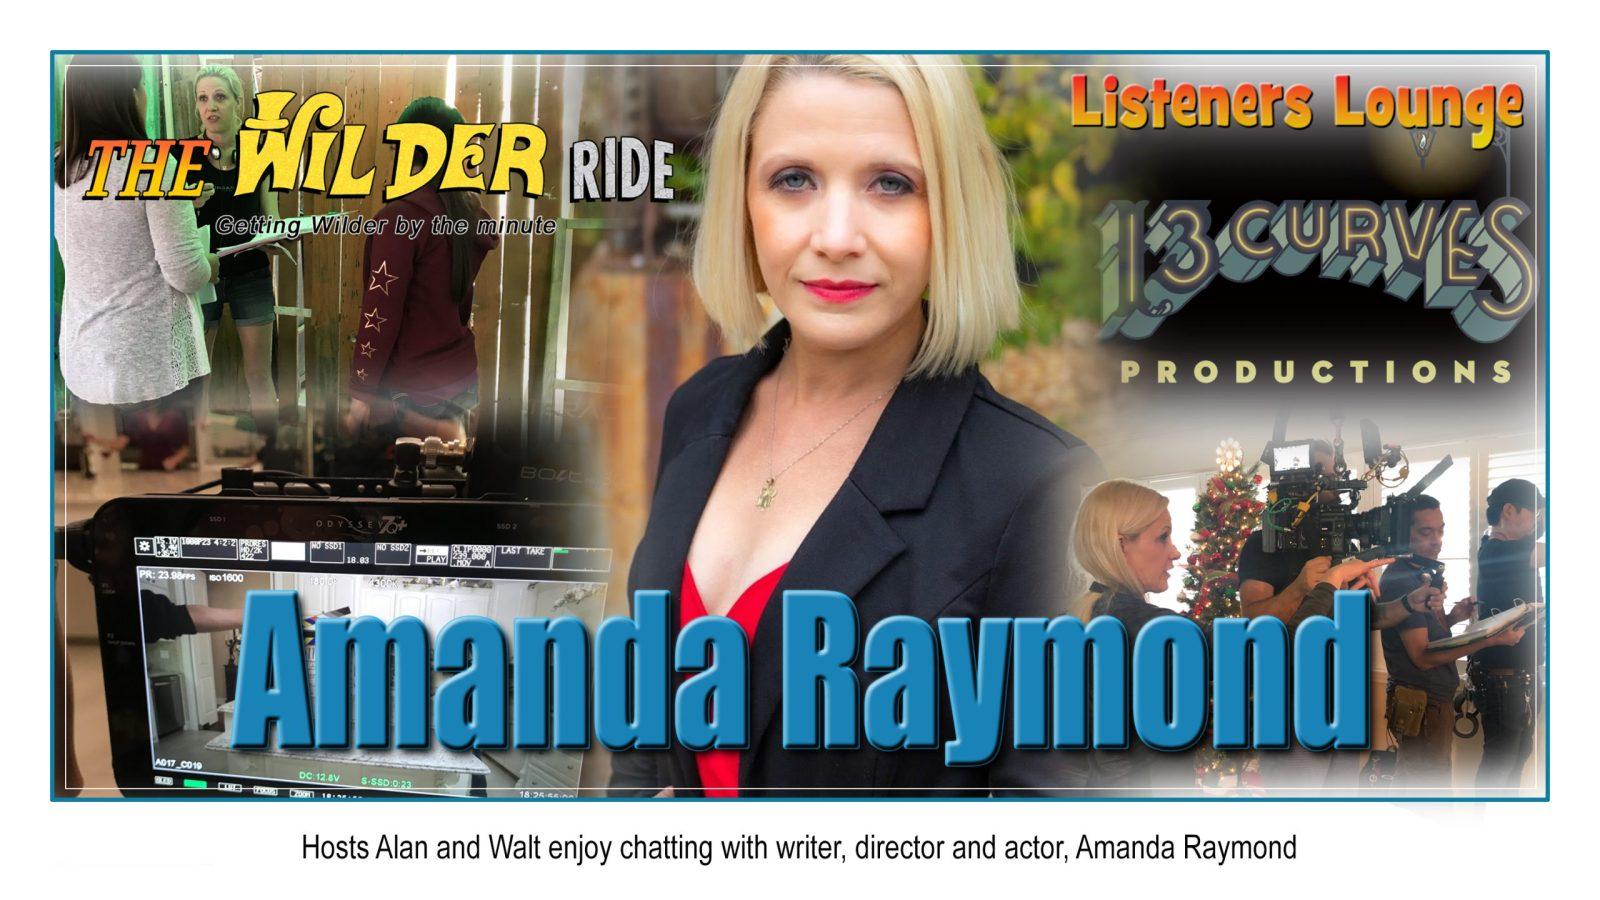 Amanda Raymond